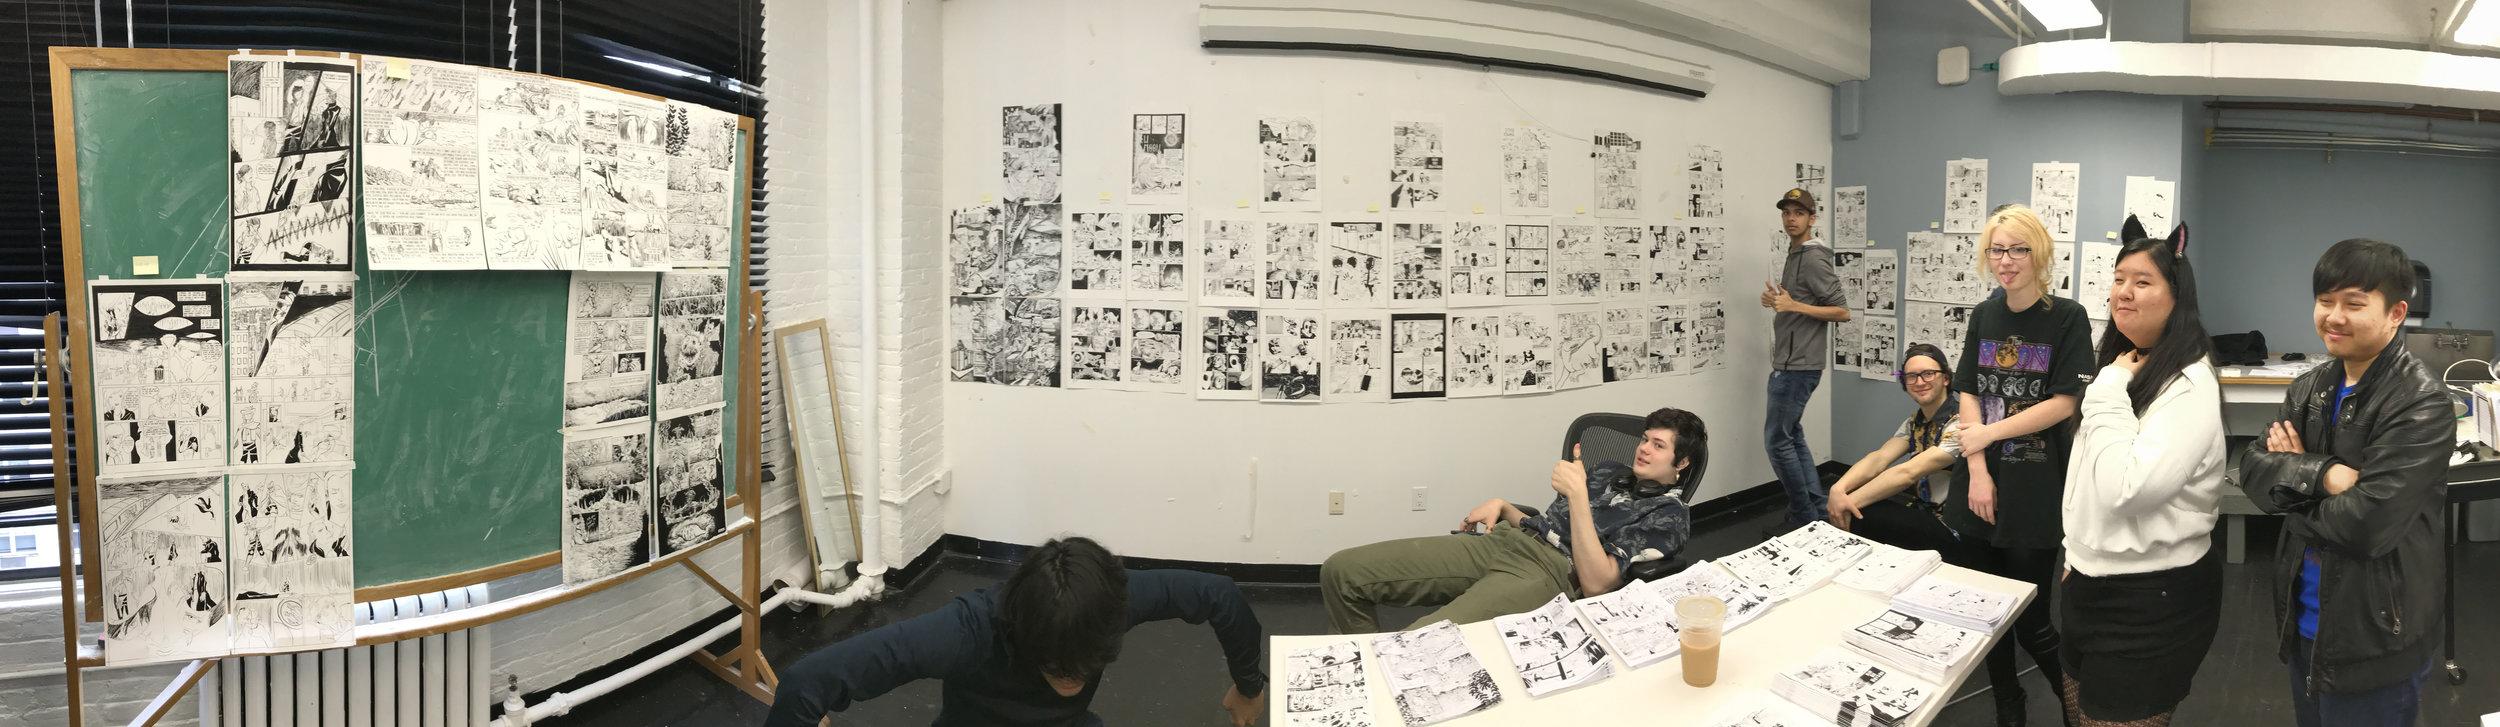 Final crit in Principles of Cartooning '18 - '19.